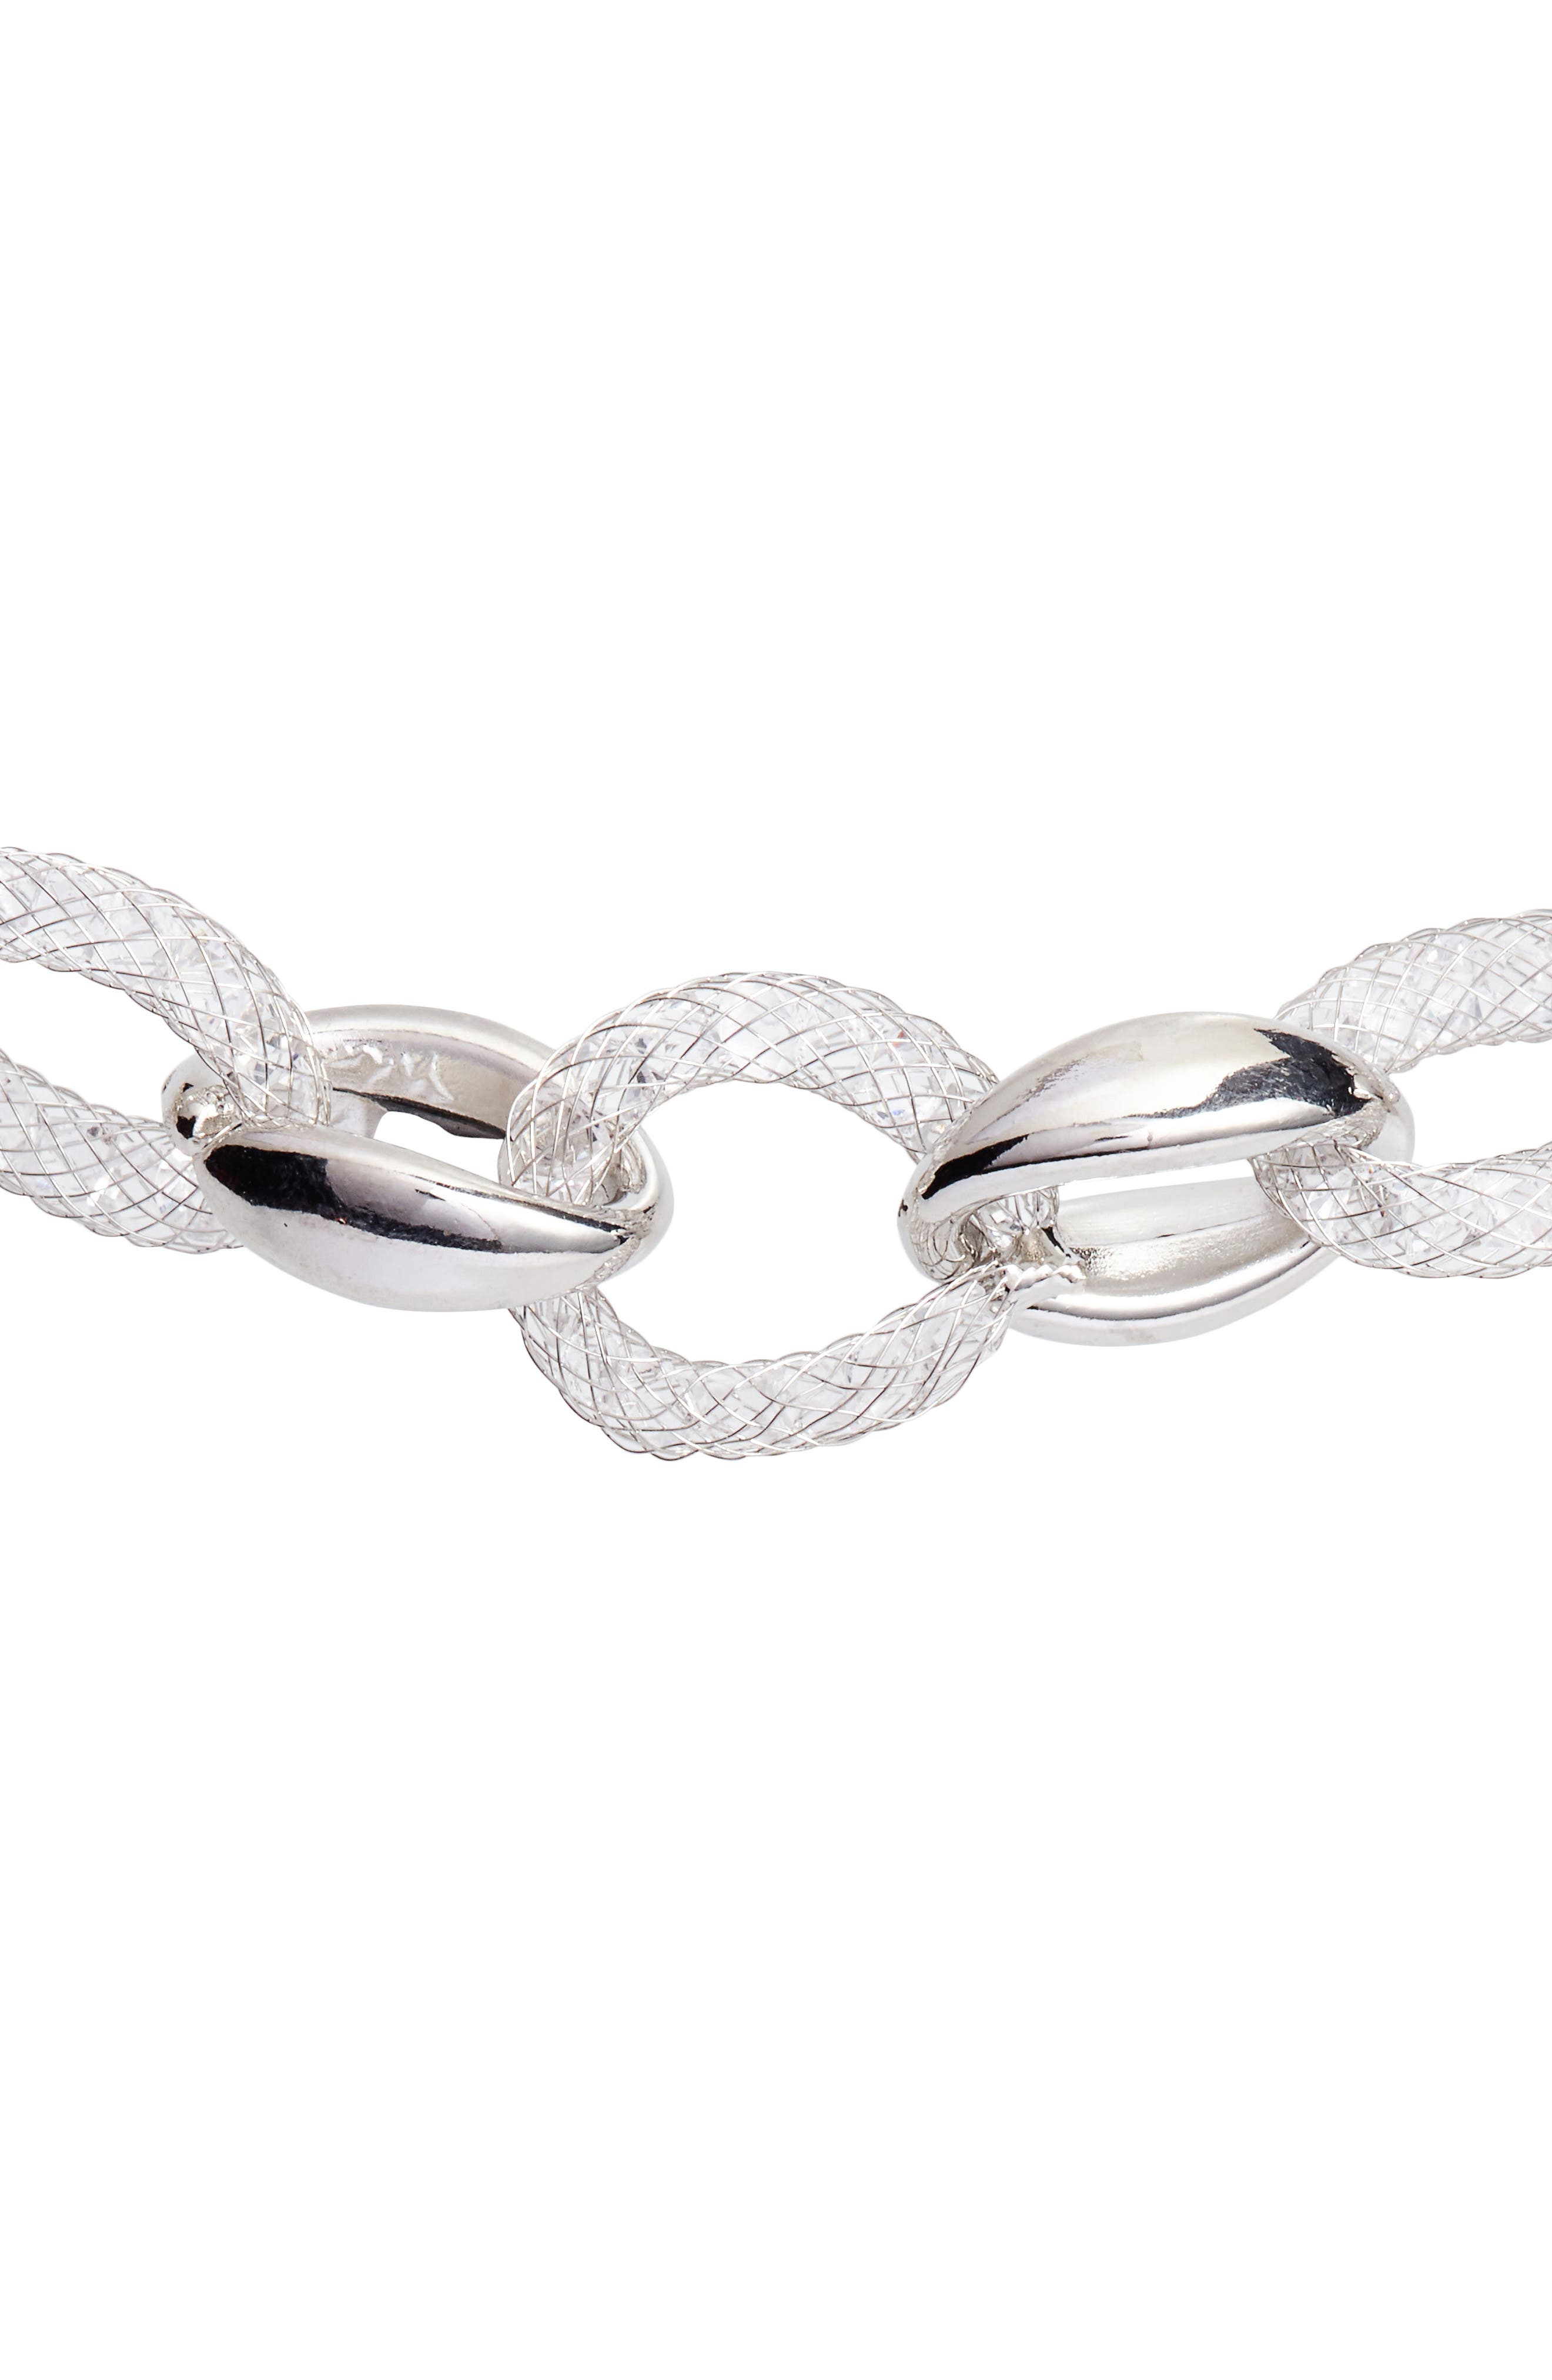 Marchella Chain Link Necklace,                         Main,                         color,